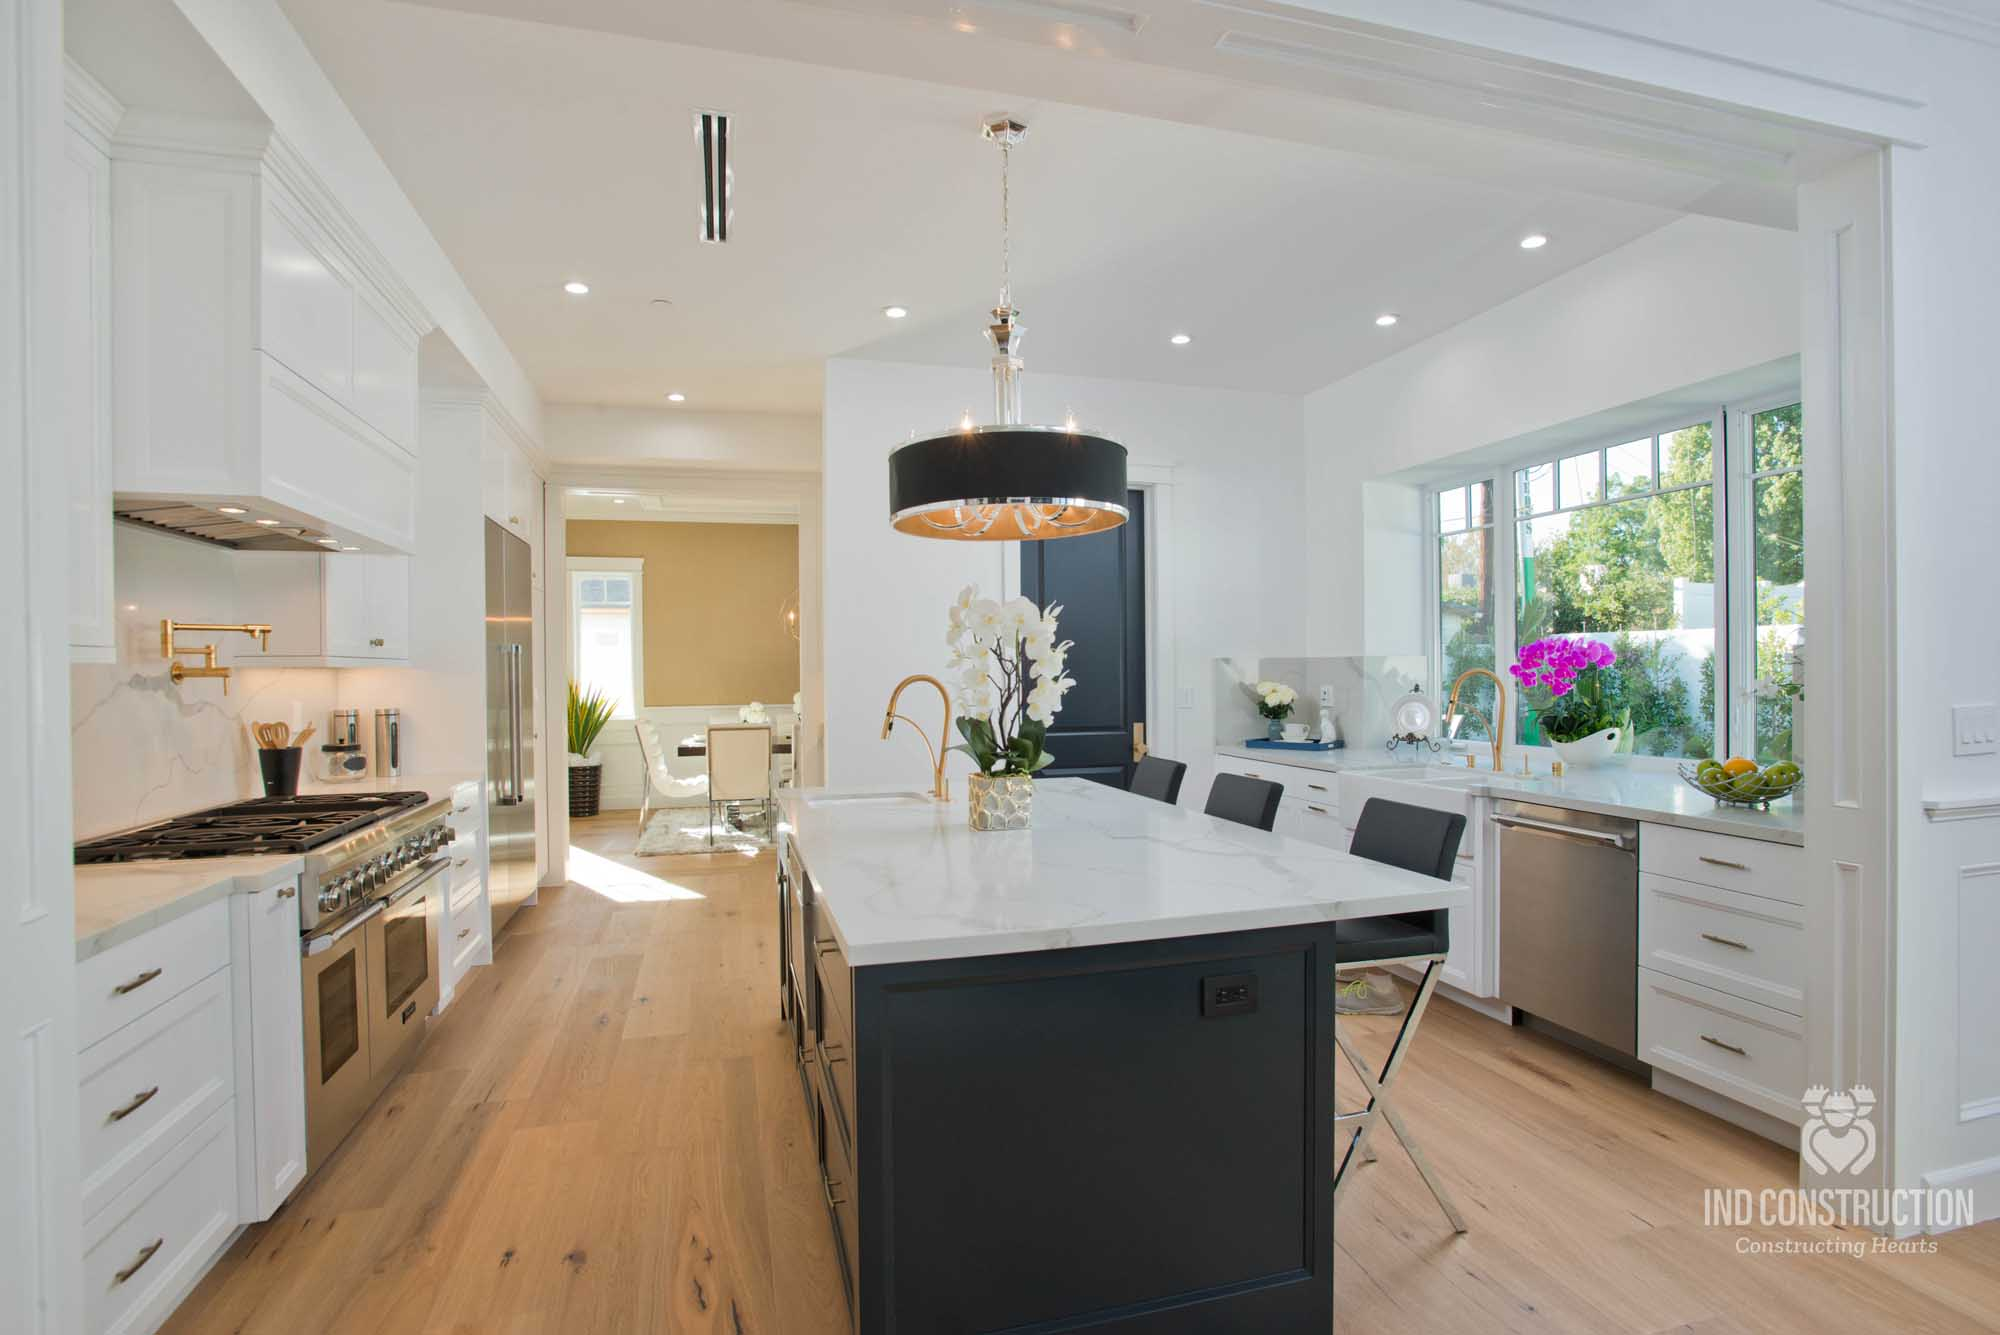 16-Interior-Renovation-Modern-Cape-Cod-Spec-Sherman-Oaks